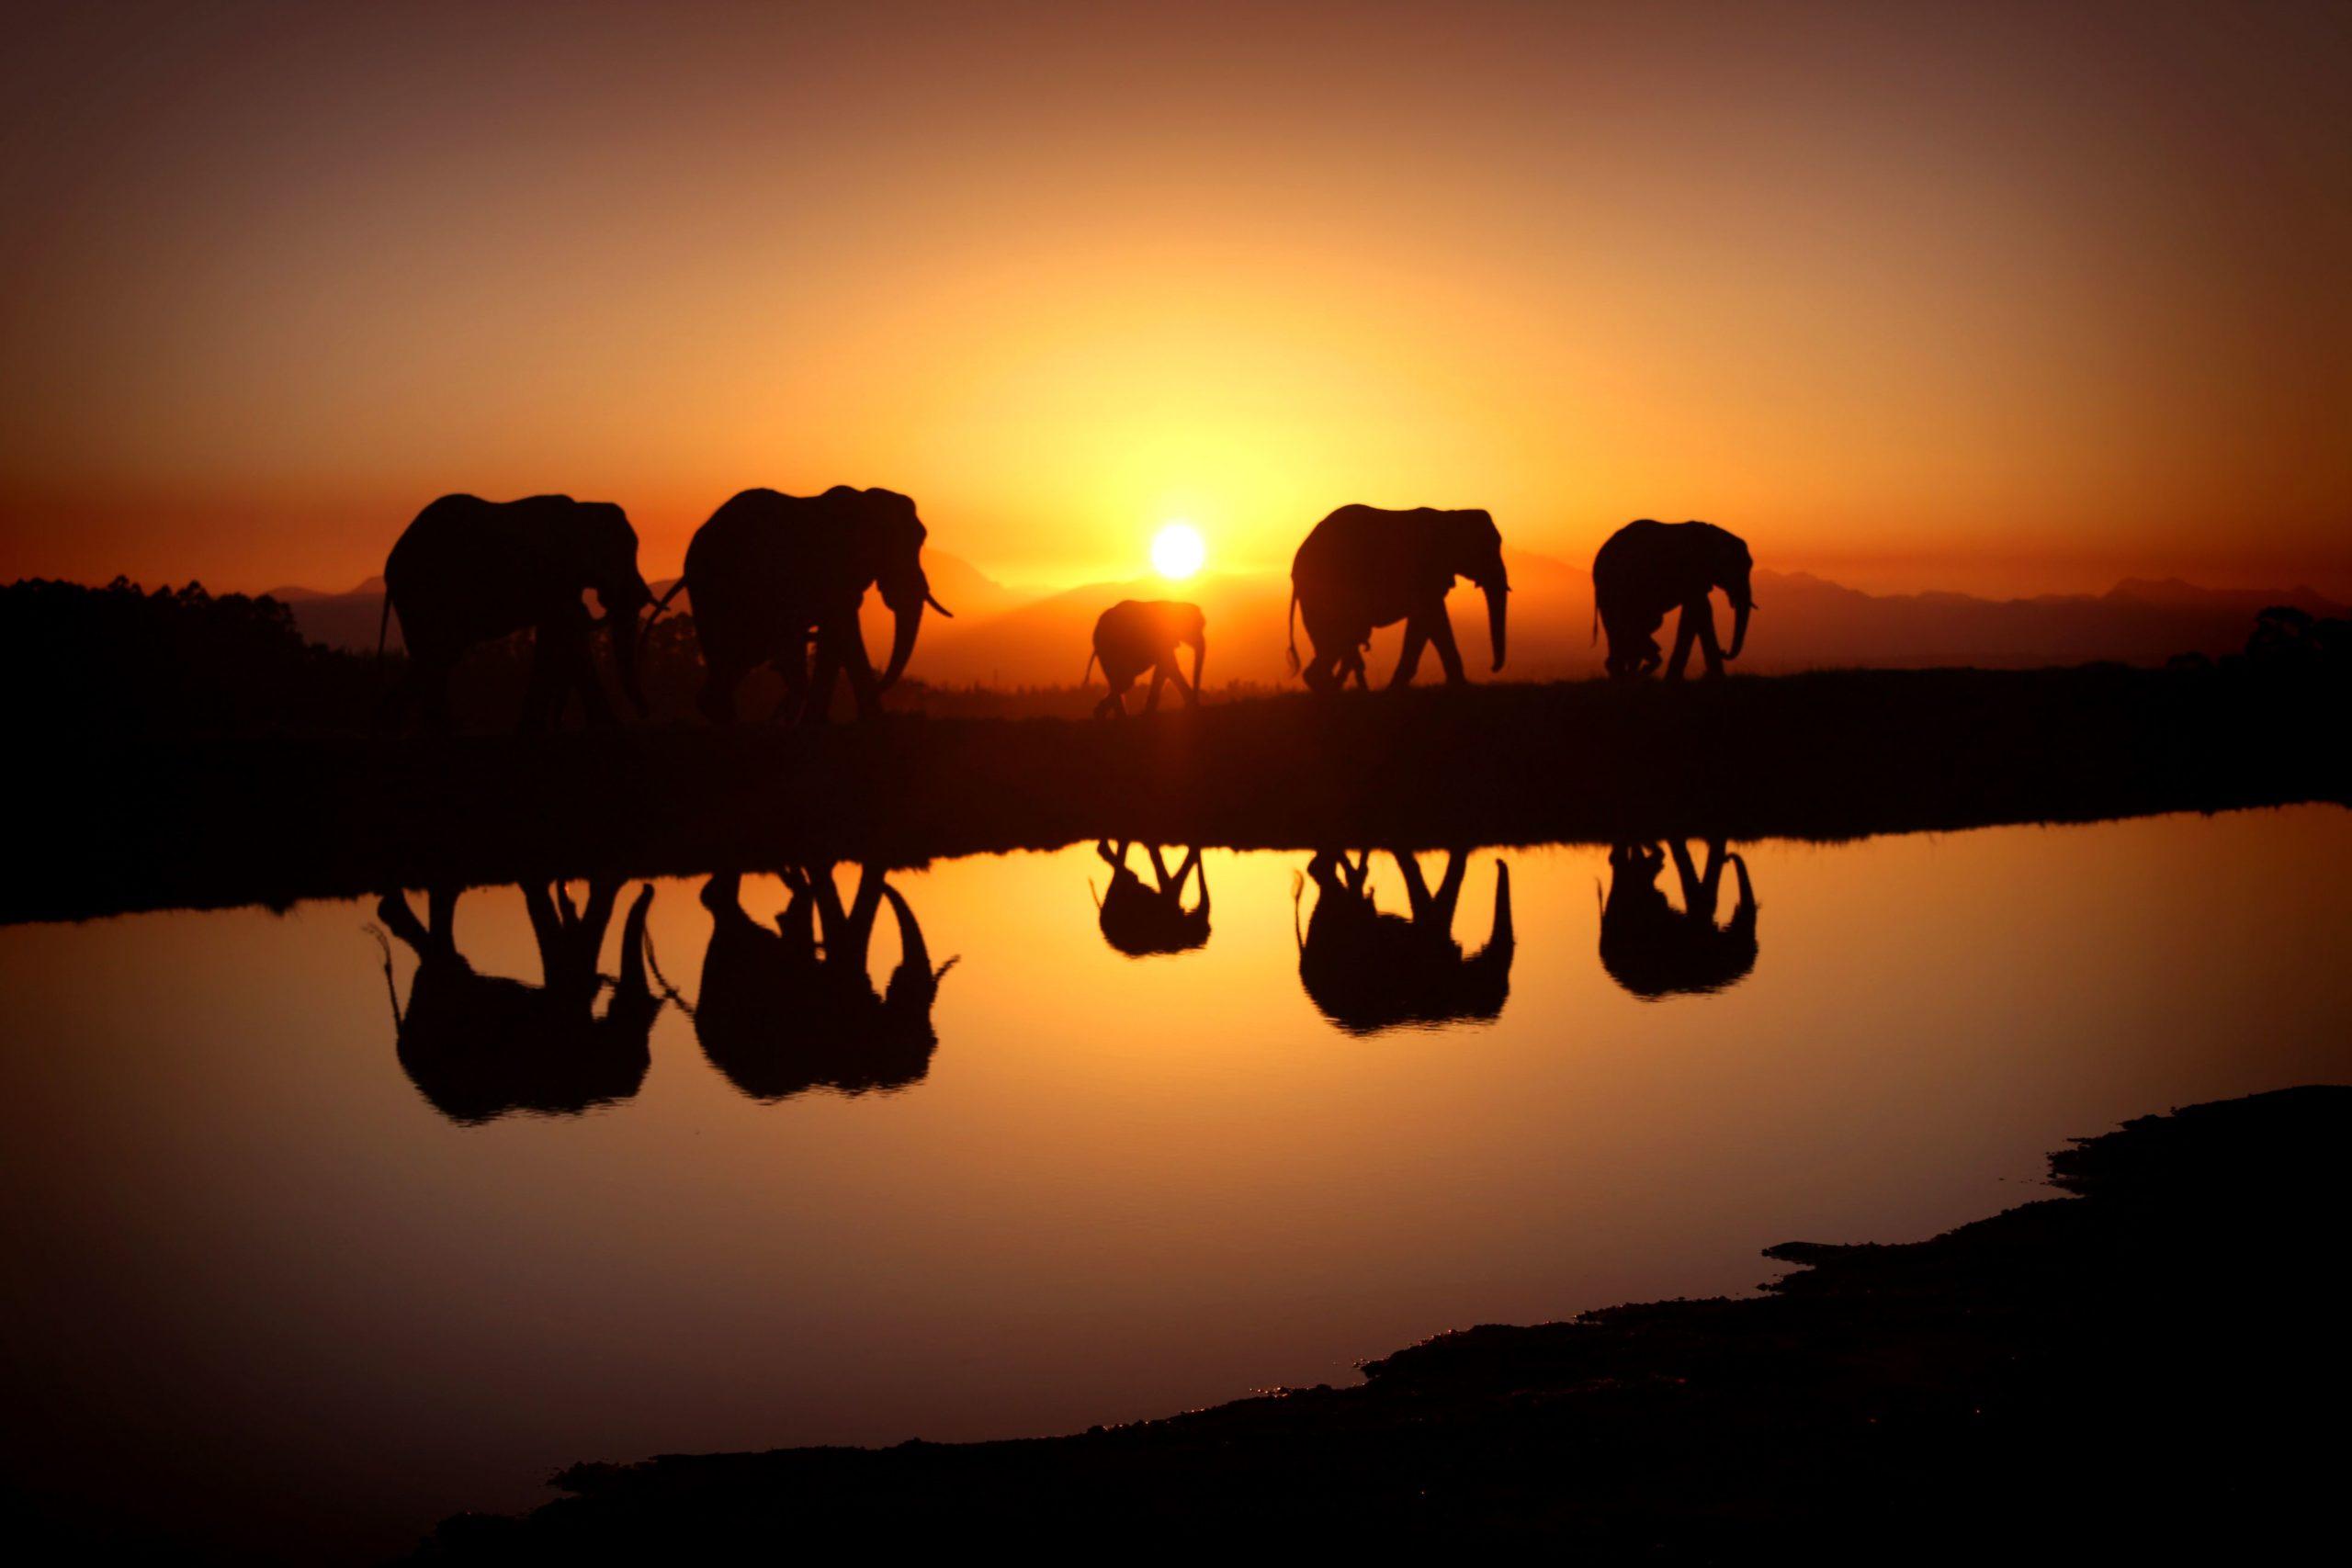 free elephant wallpaper